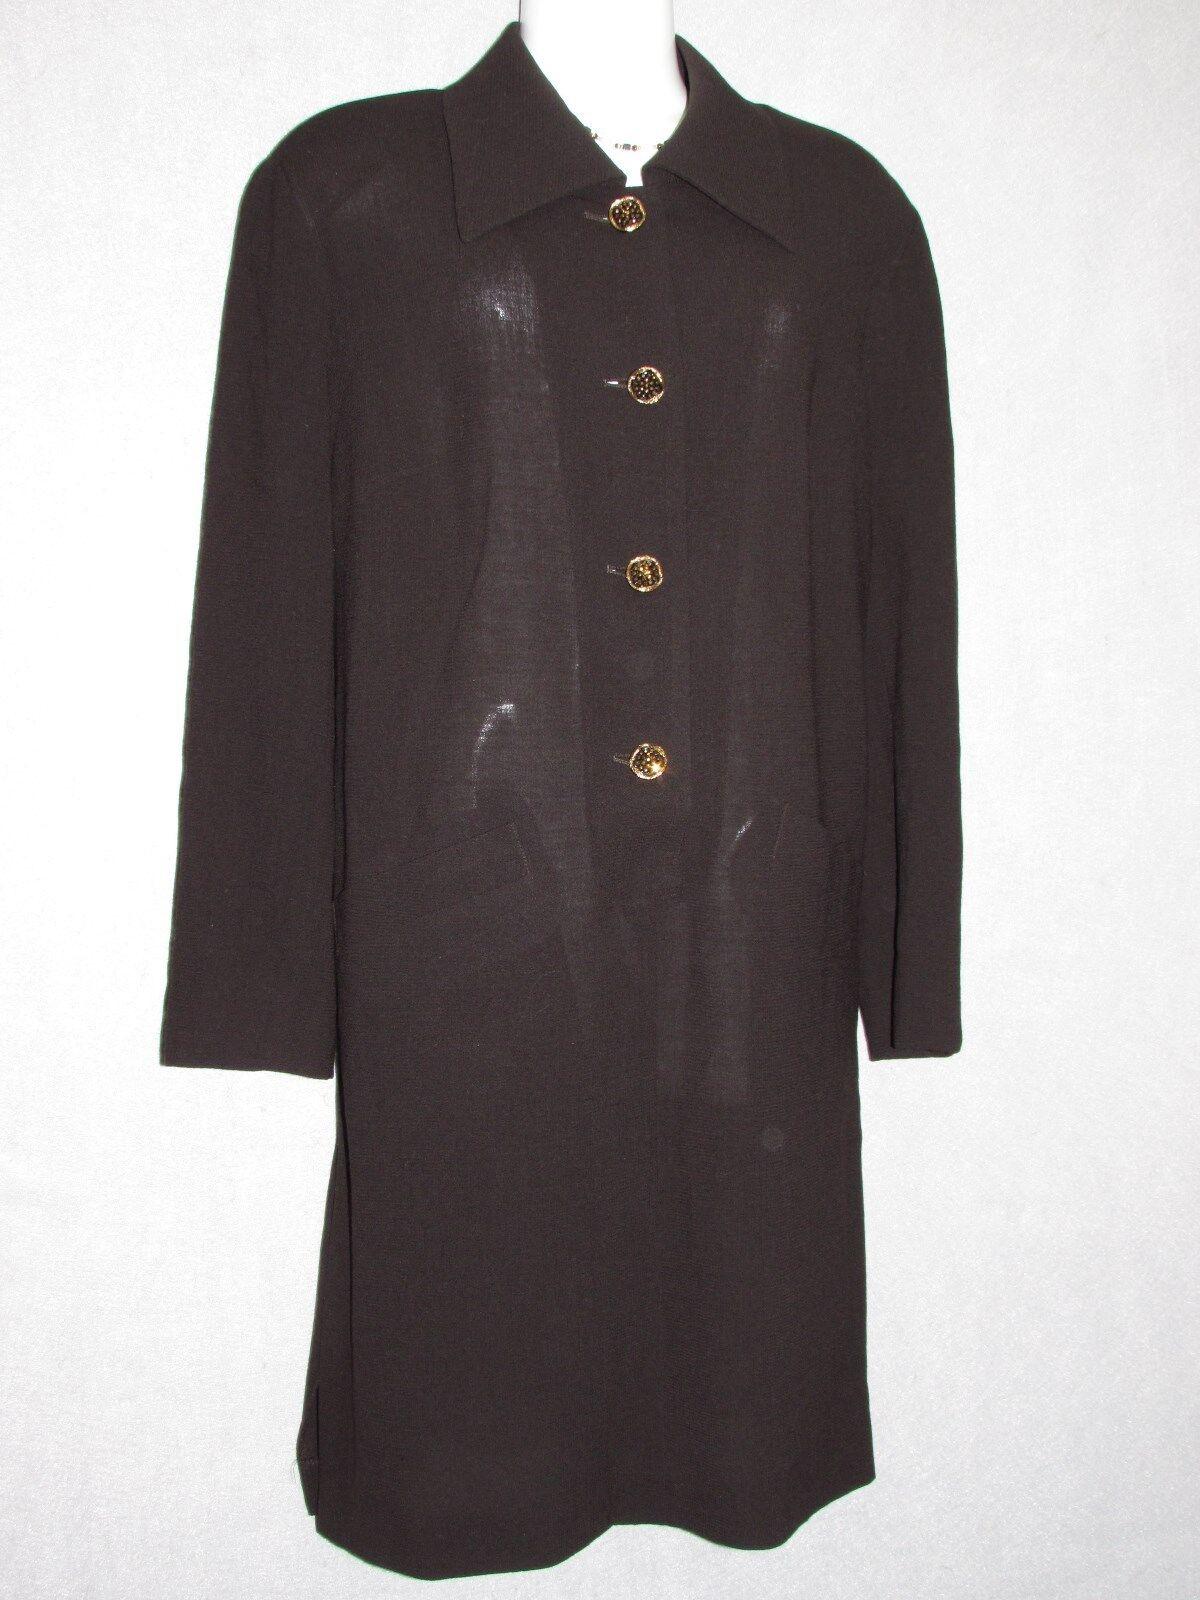 LOUIS FERAUD Maroon New Wool Long Sleeve Shirt Dress SZ 10 NEW